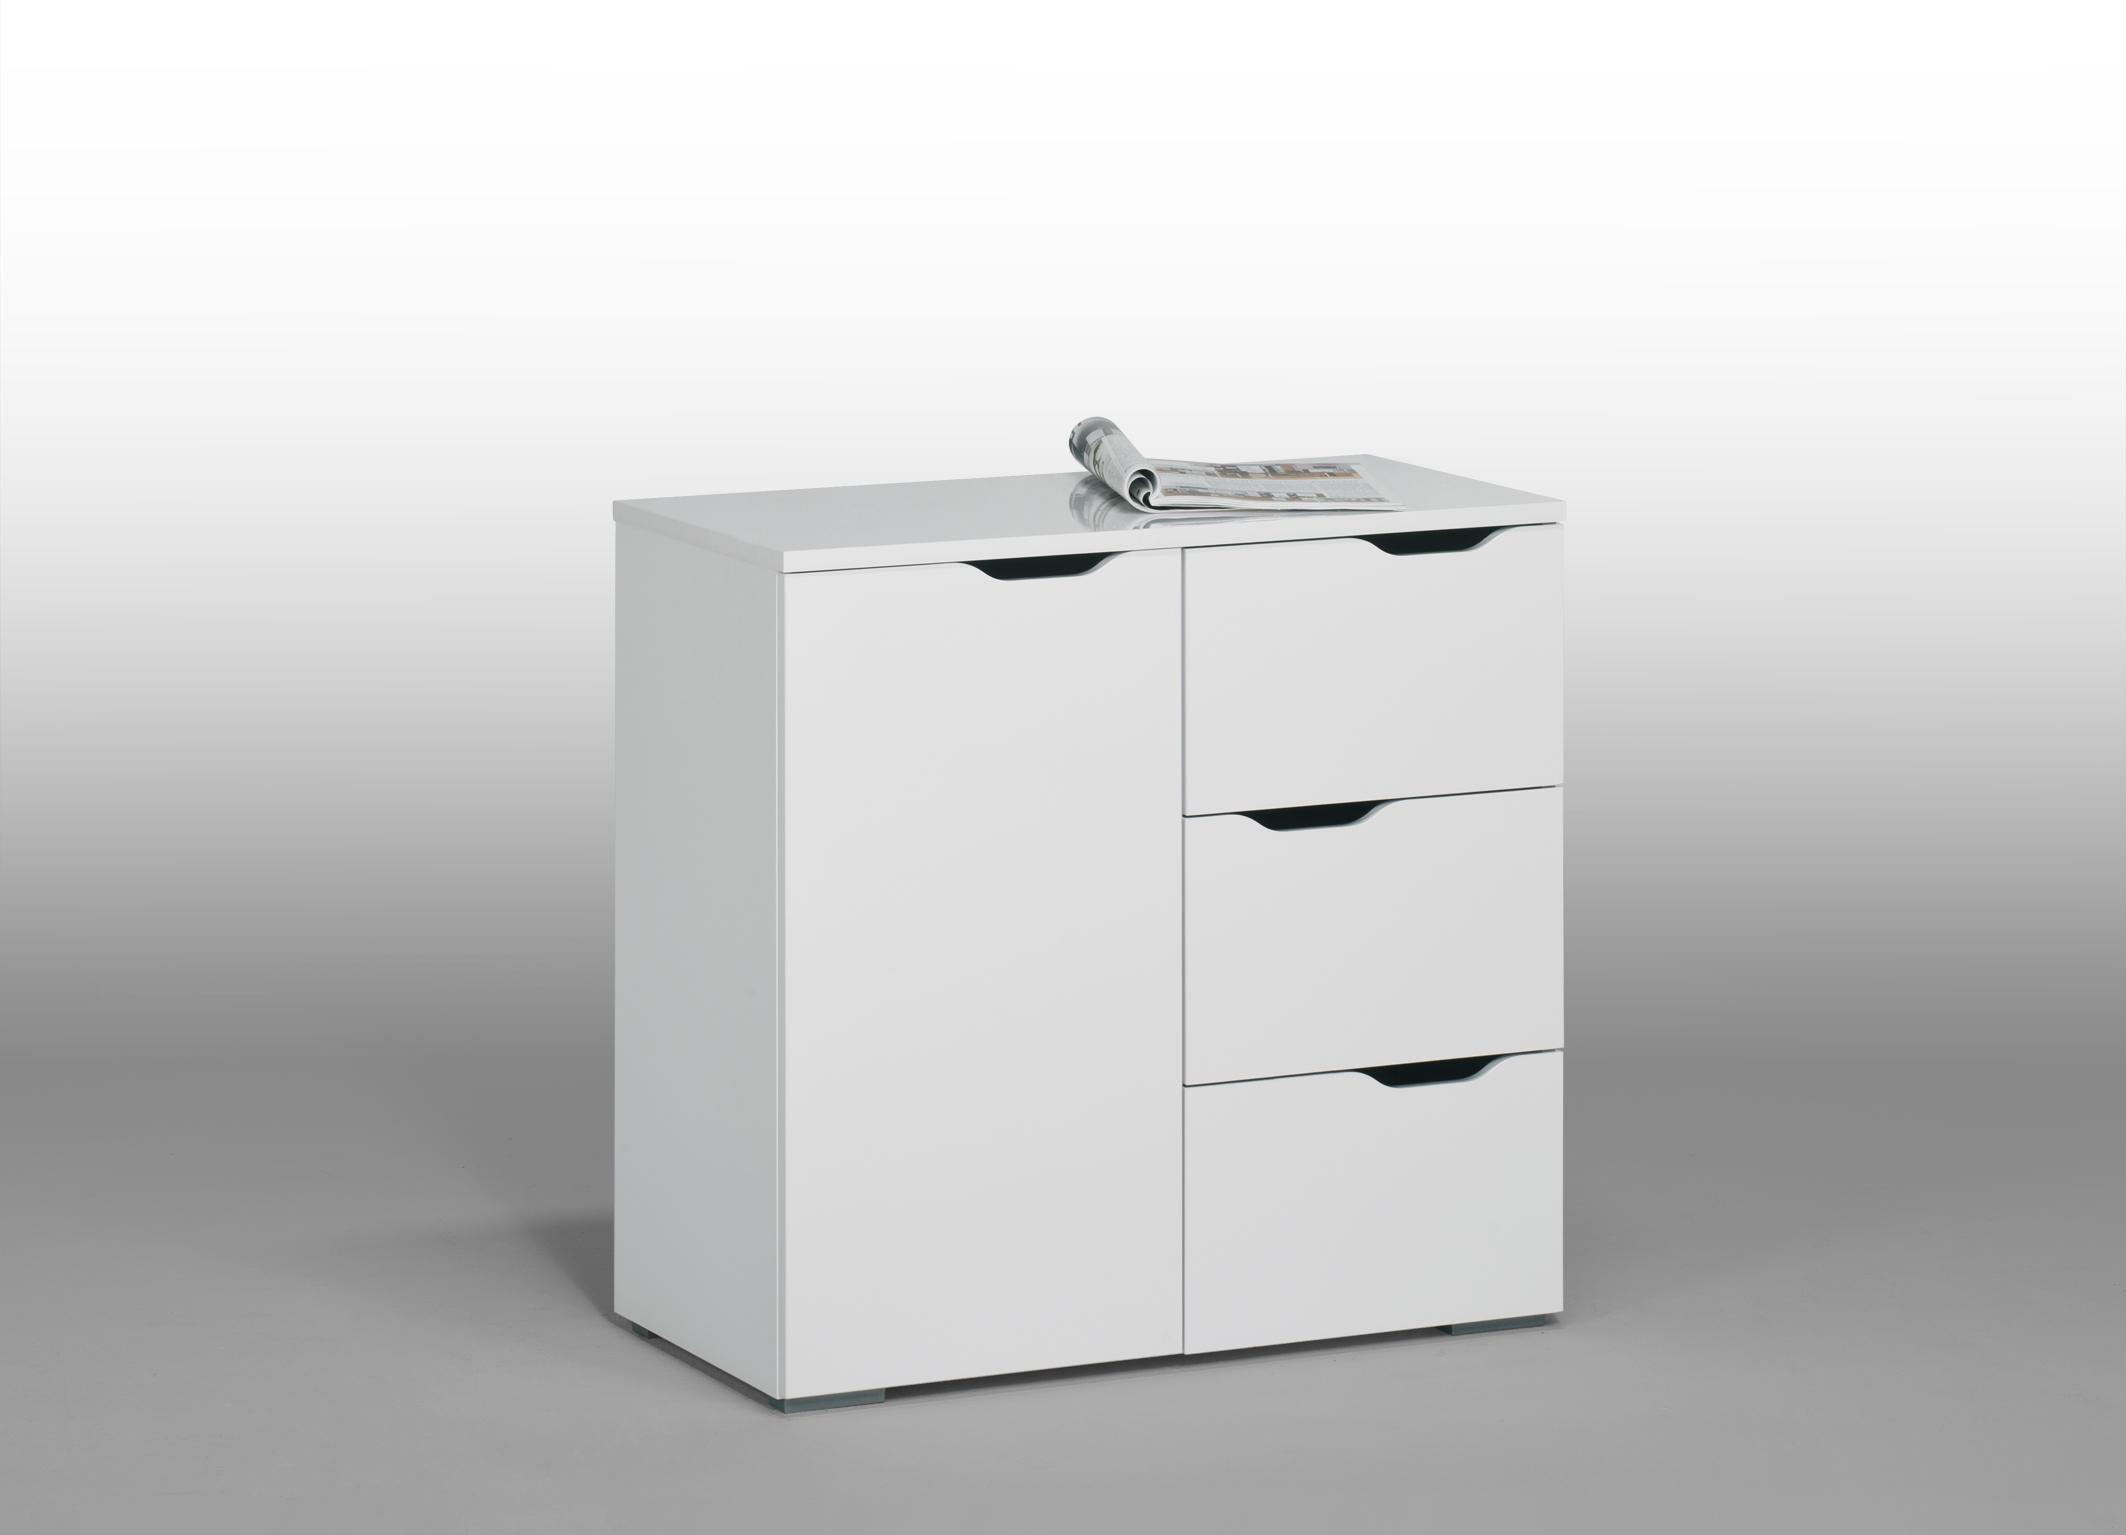 Meubles maison pas cher meuble maison pas cher gleicou for Site meuble design